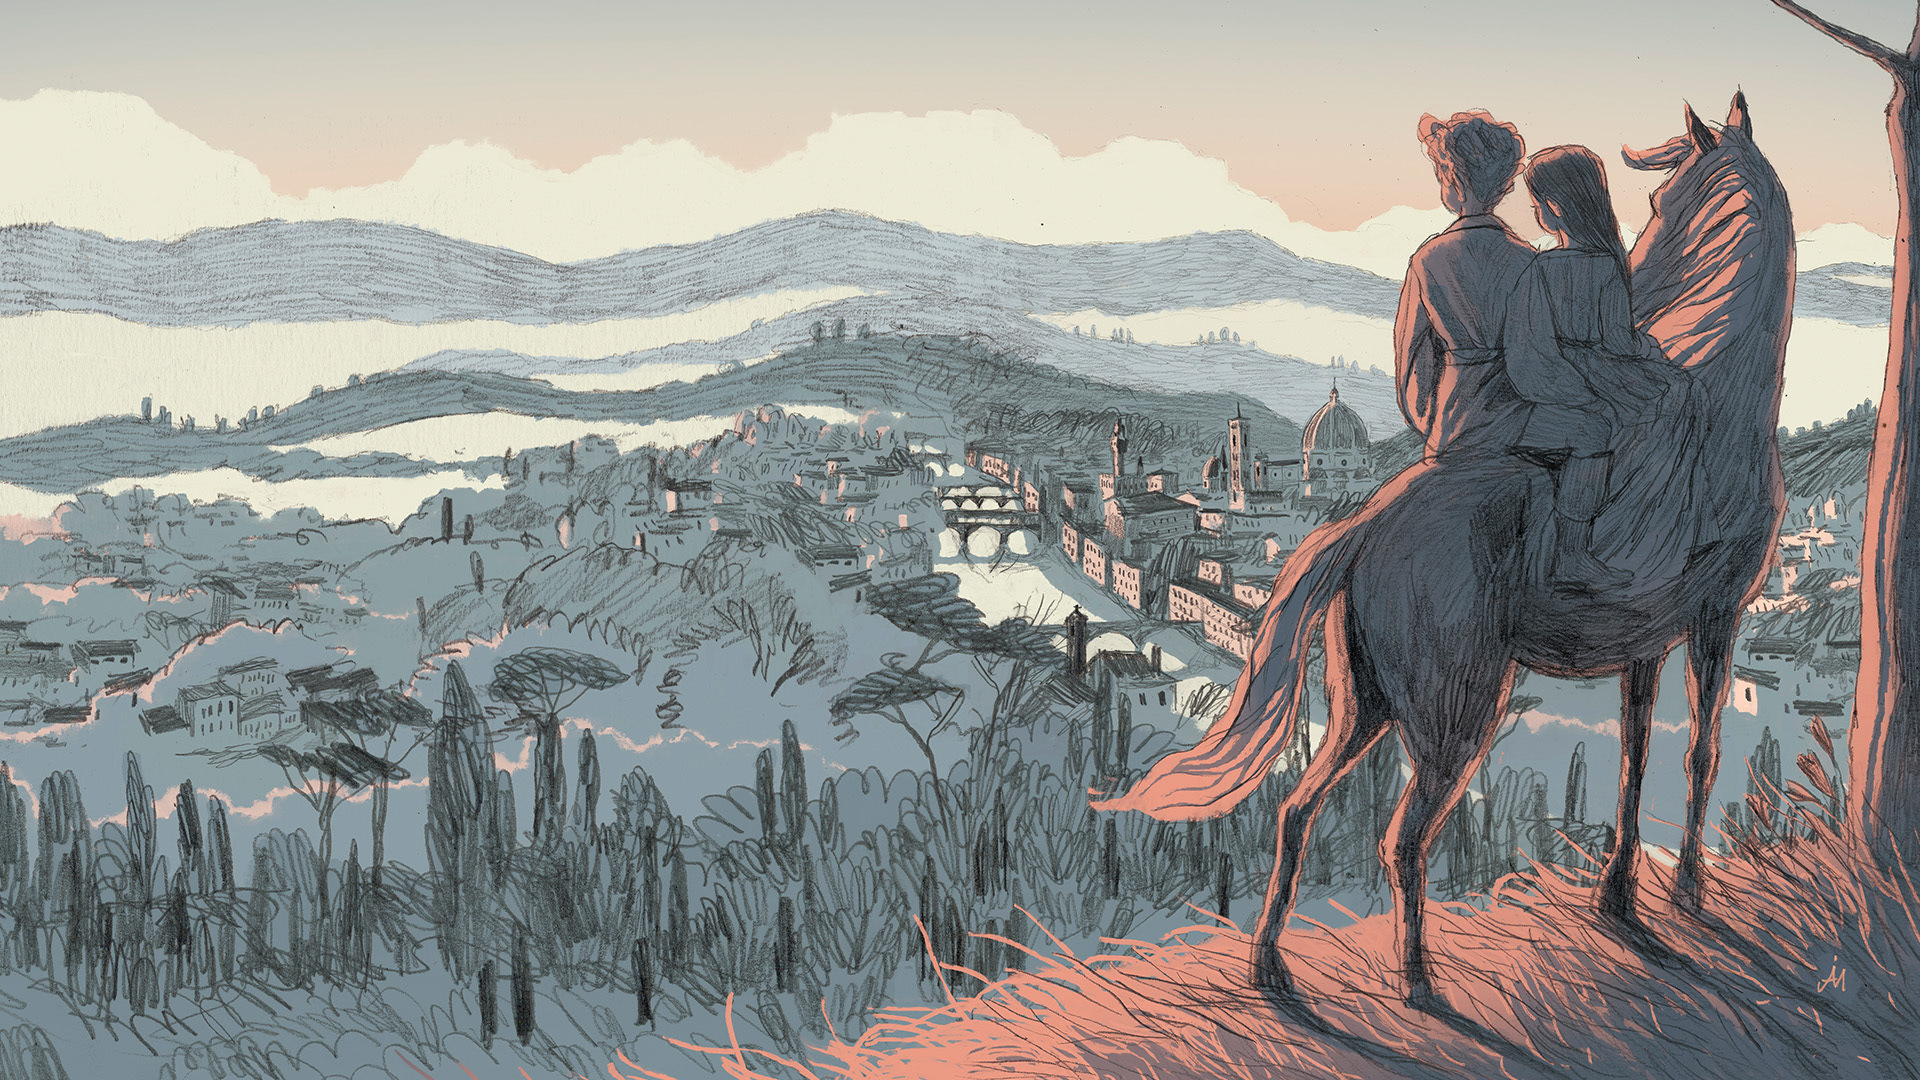 Illustration by Giacomo Agnello Modica